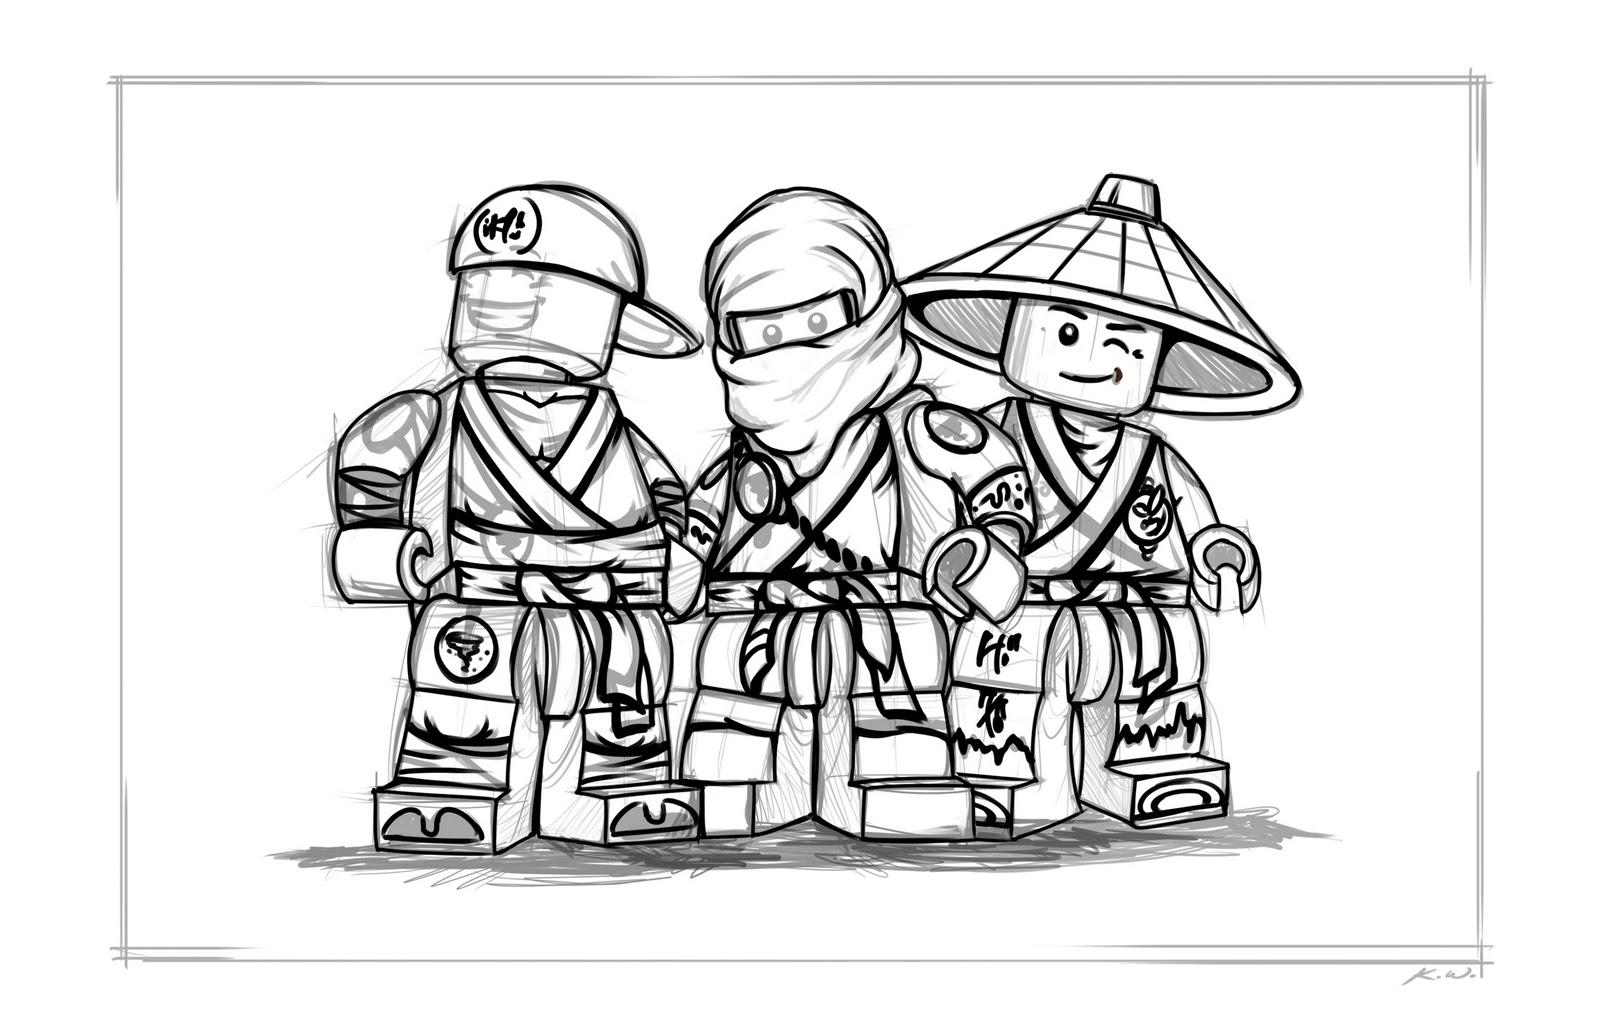 lego ninjago printables lego ninja go coloring pages 2 cricut projects ninjago lego ninjago printables